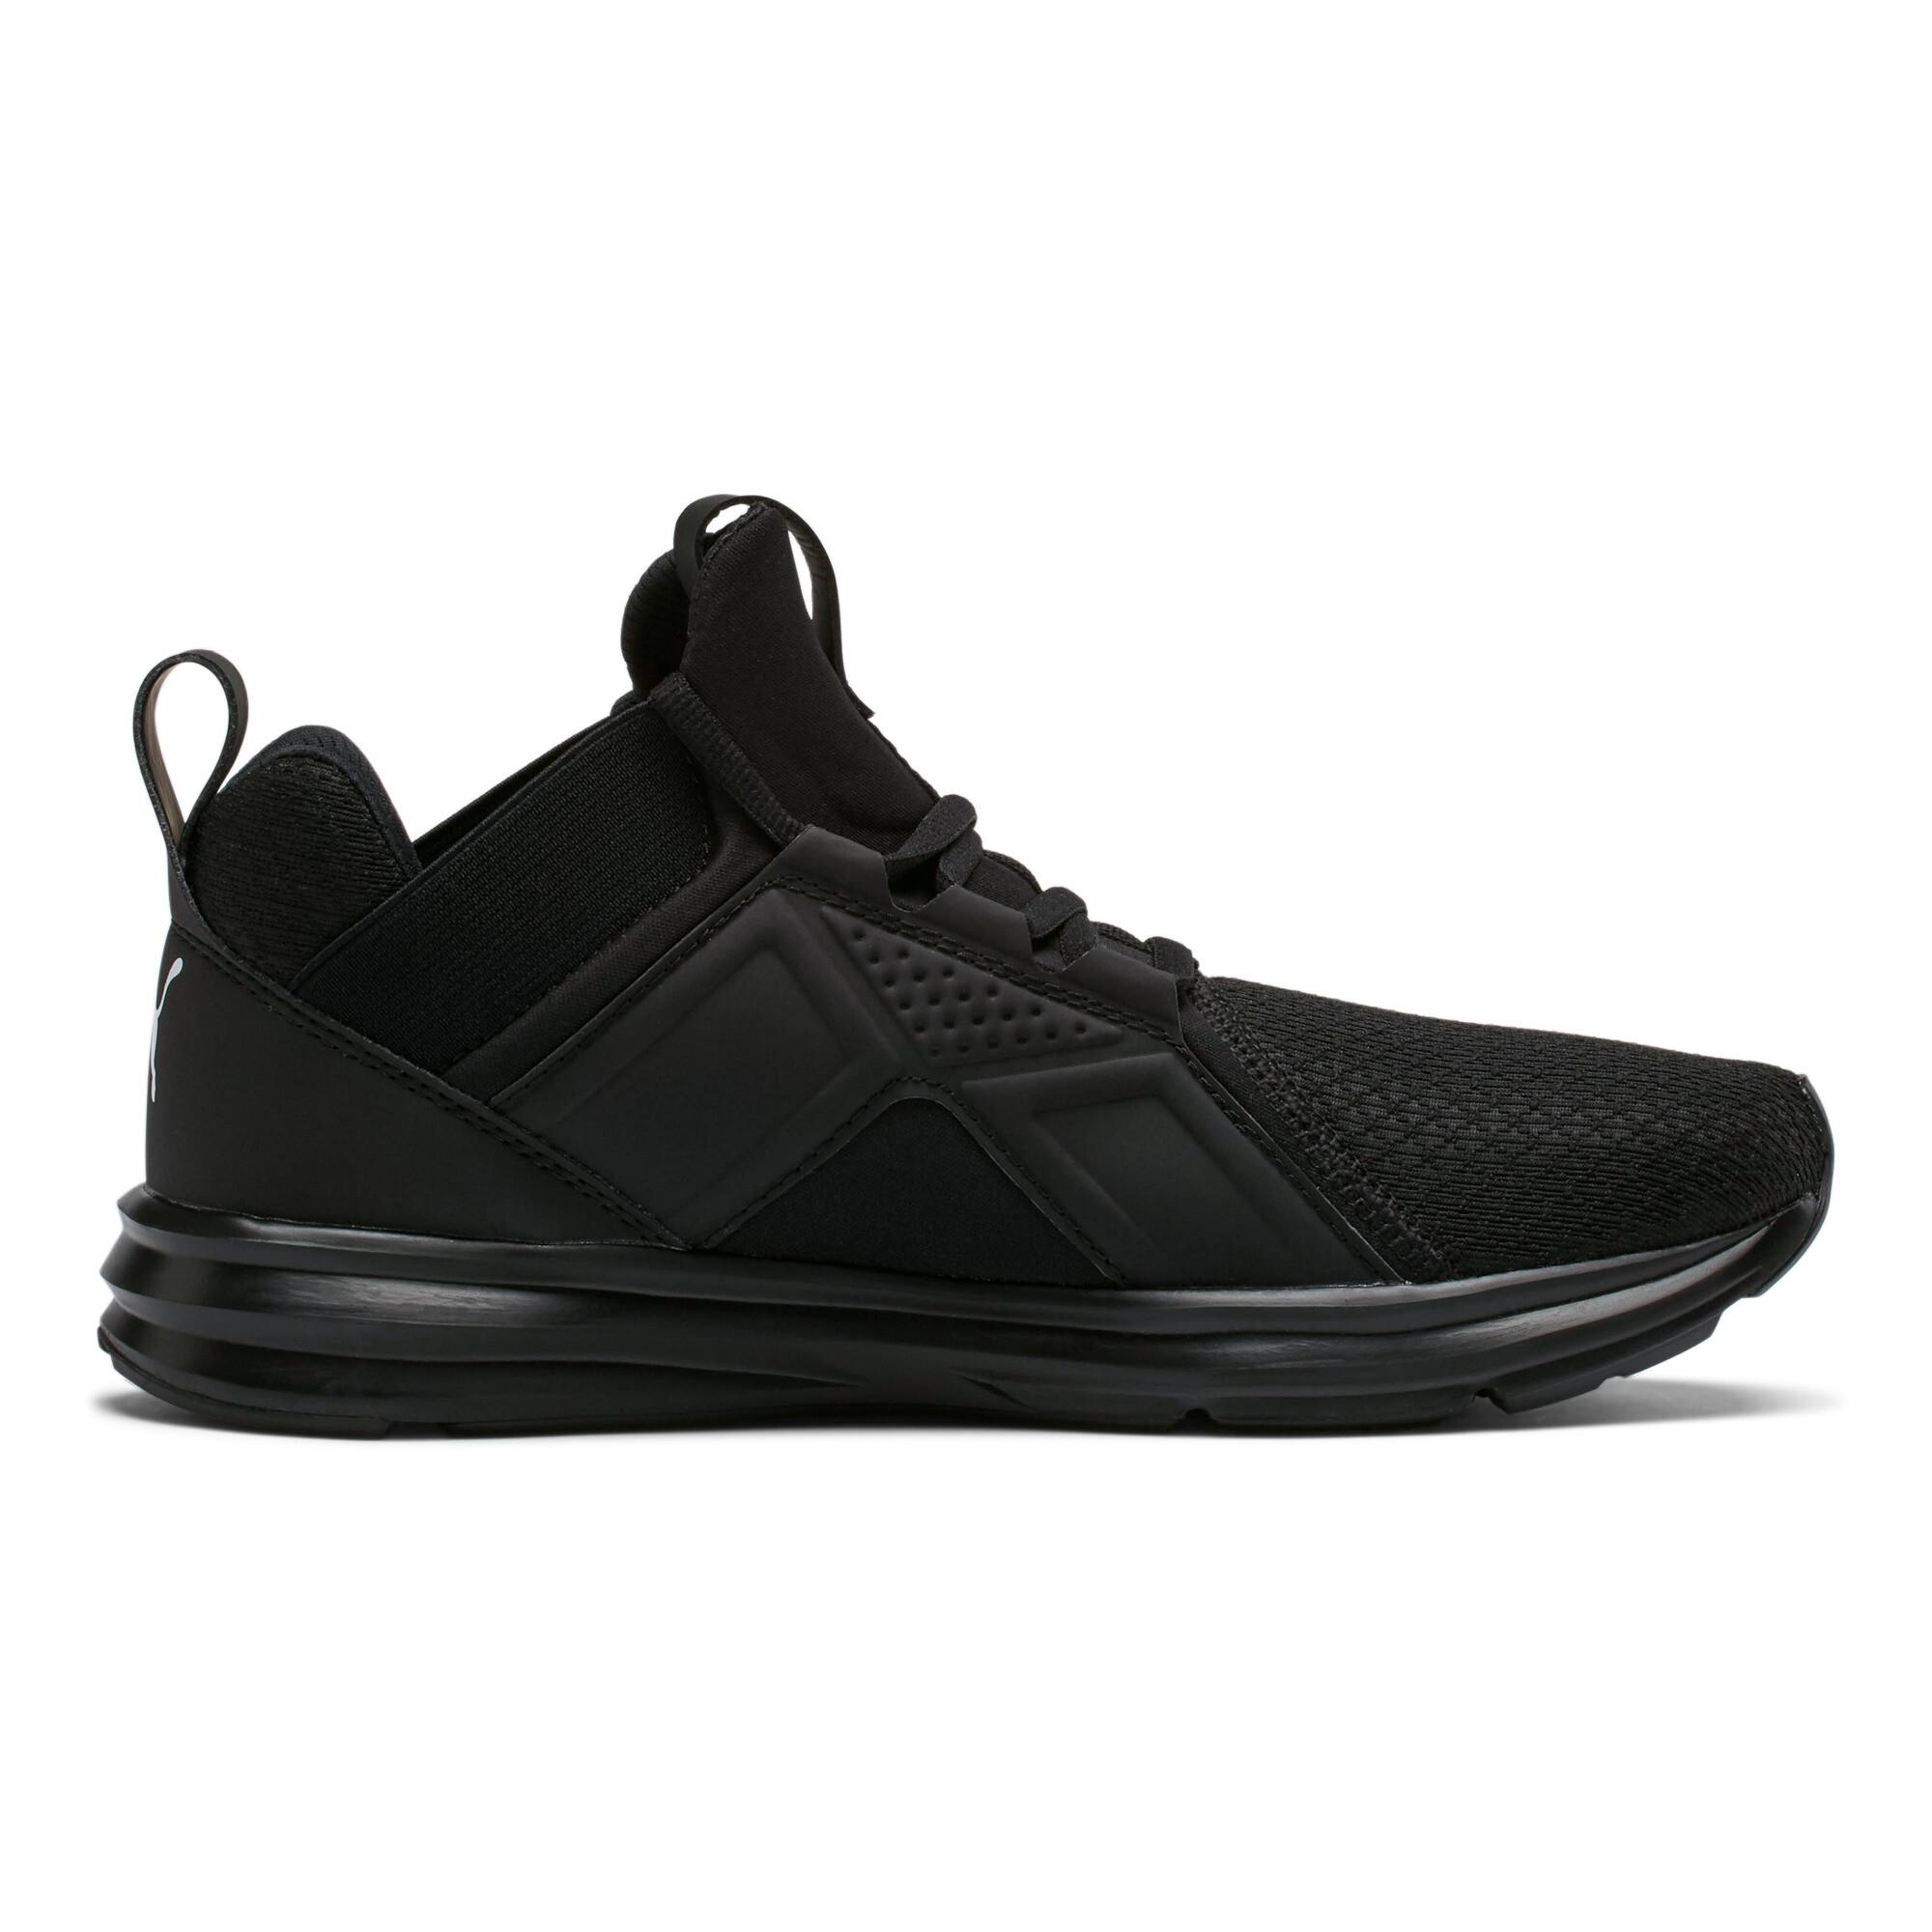 PUMA-Men-039-s-Enzo-Training-Shoes thumbnail 6